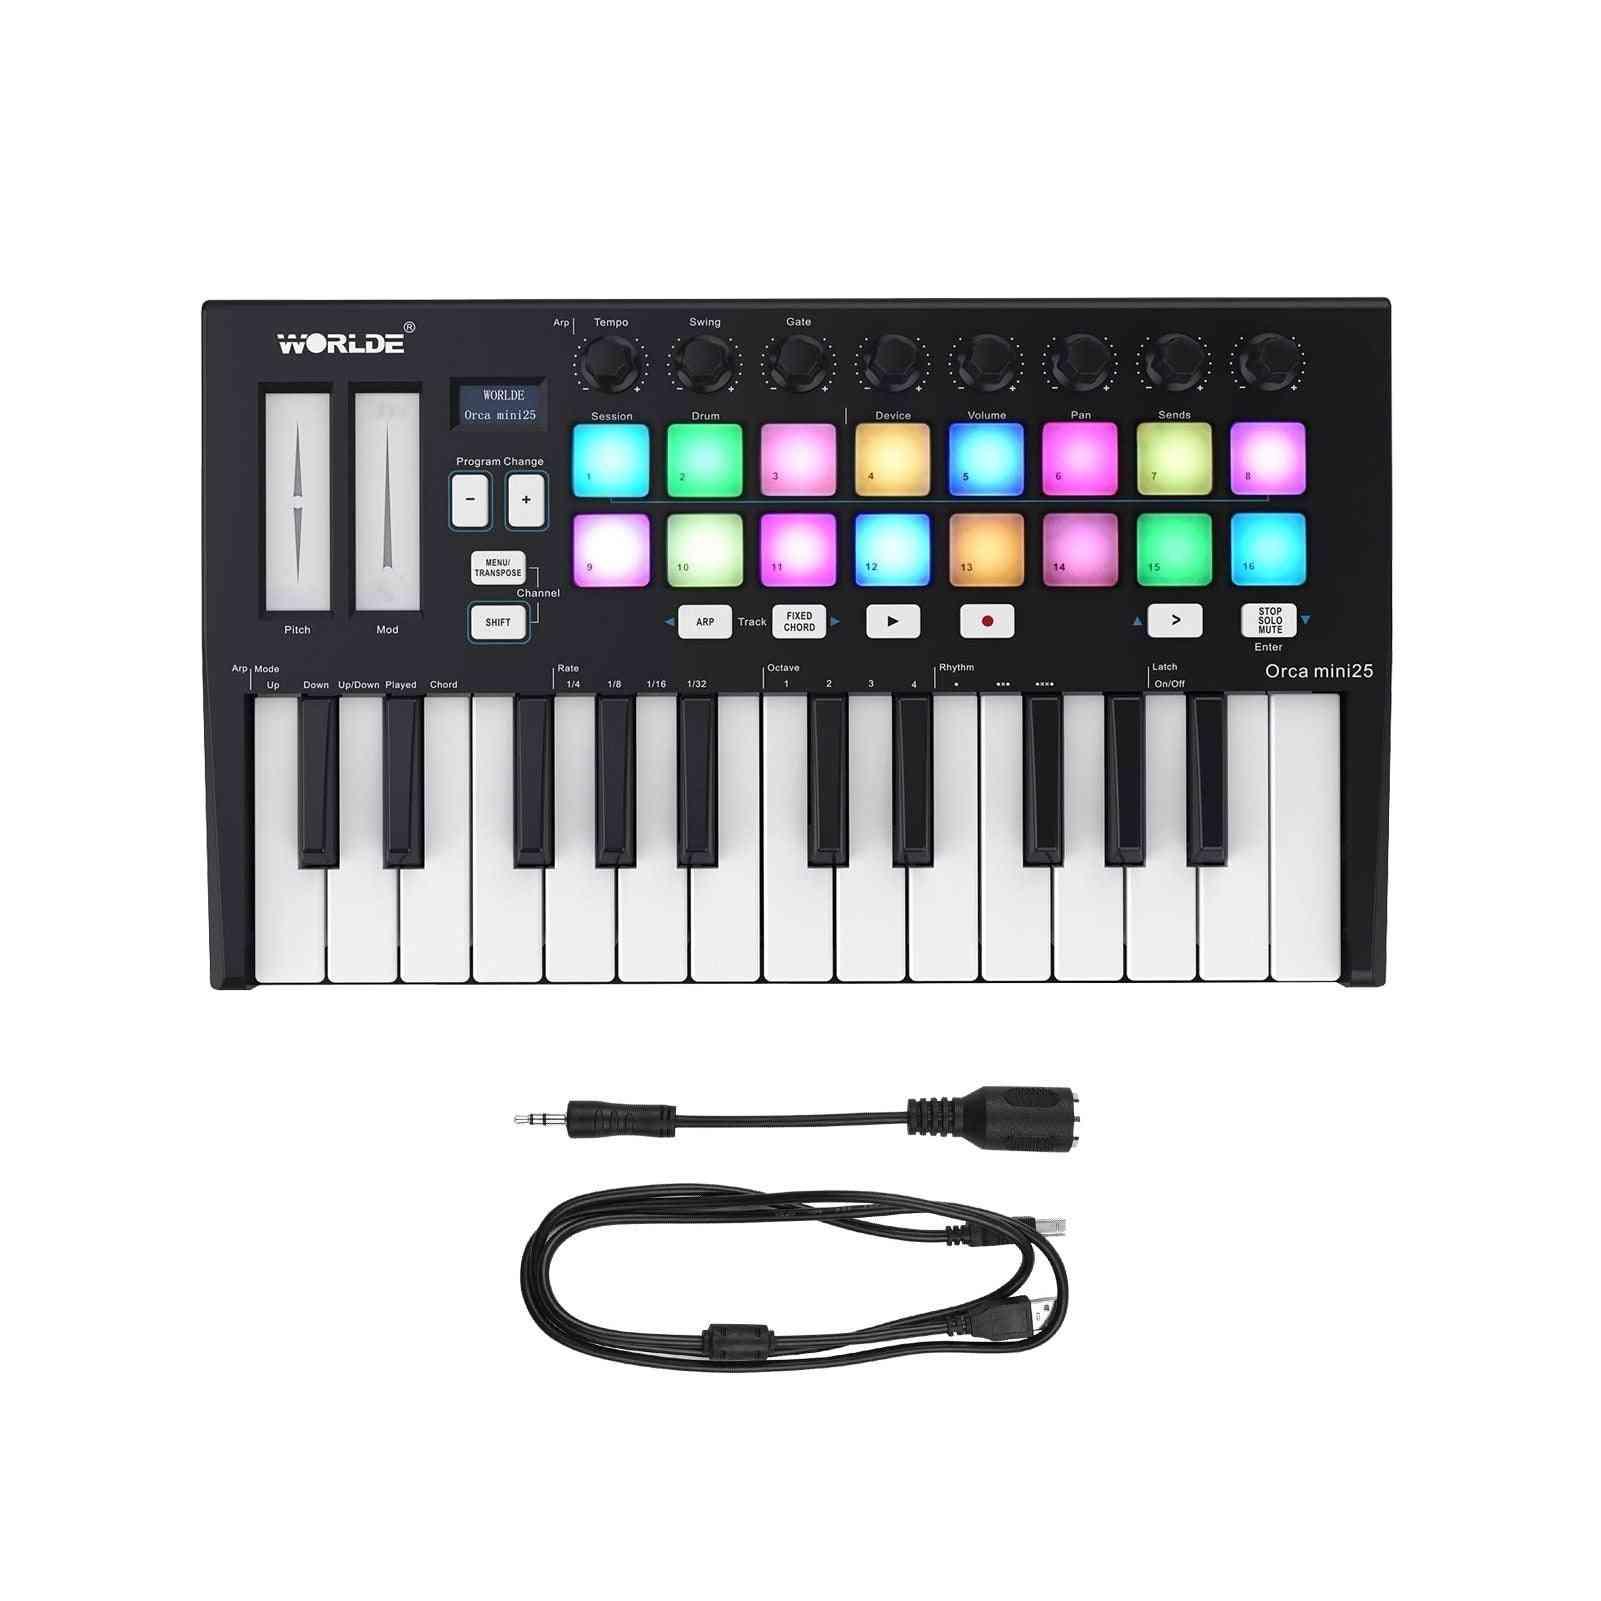 Hot Worlde Panda Midi Keyboard Midi Controller & Drum Pad Mini 25-key Ultra-portable Usb Midi Keyboard Controller Led 7 Styles